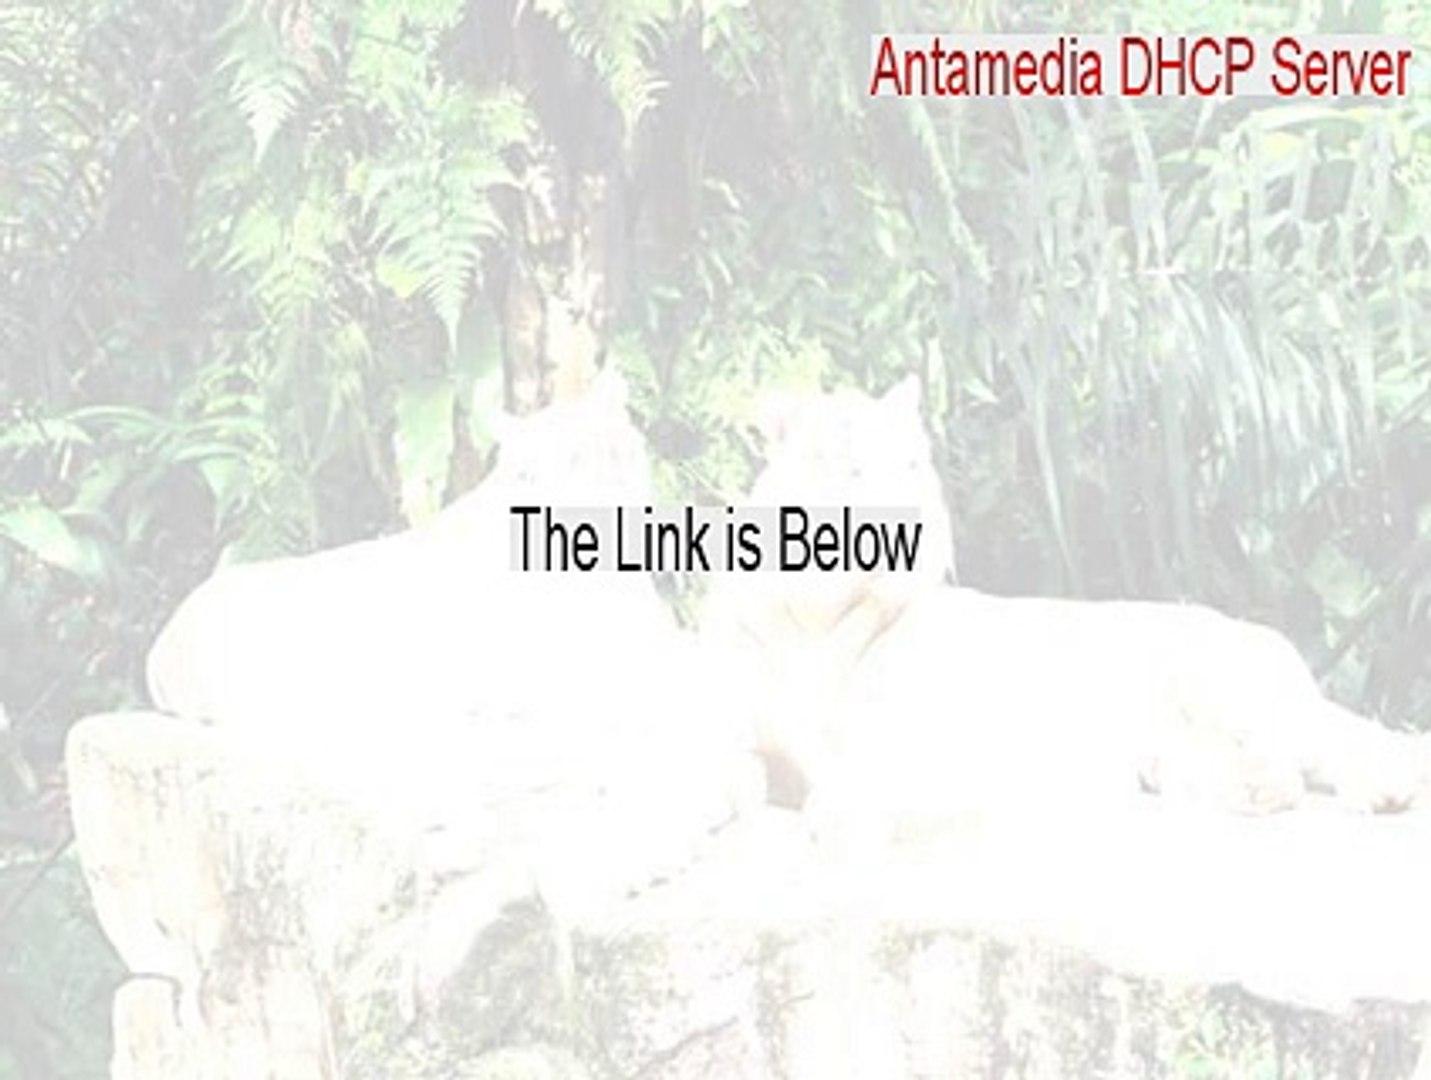 Antamedia DHCP Server Full Download [Download Now]